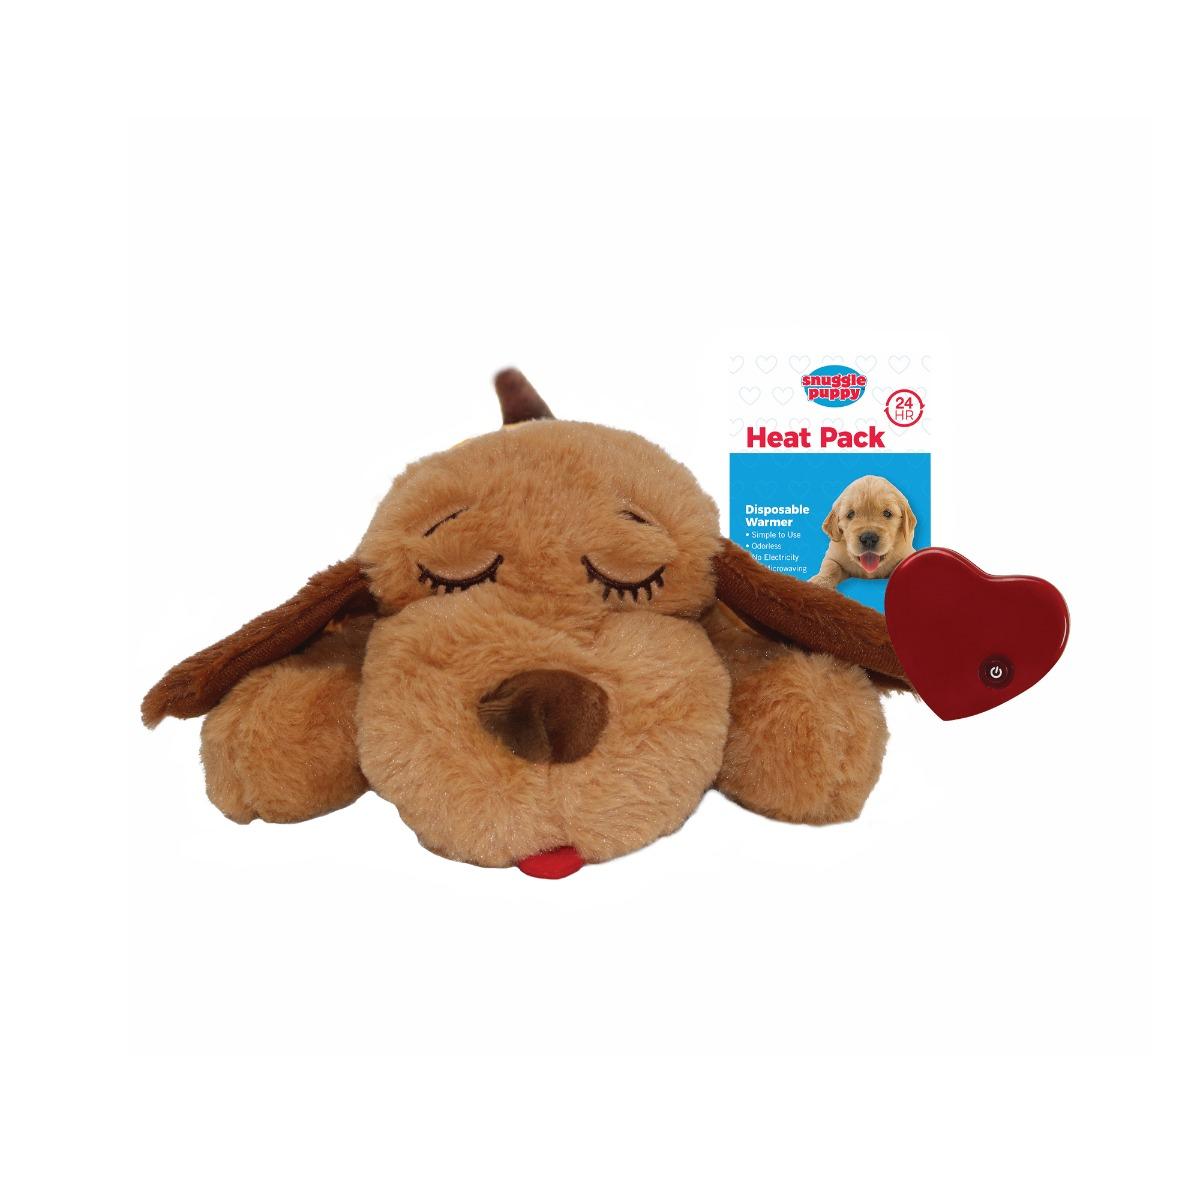 Snuggle Puppy - Biscuit